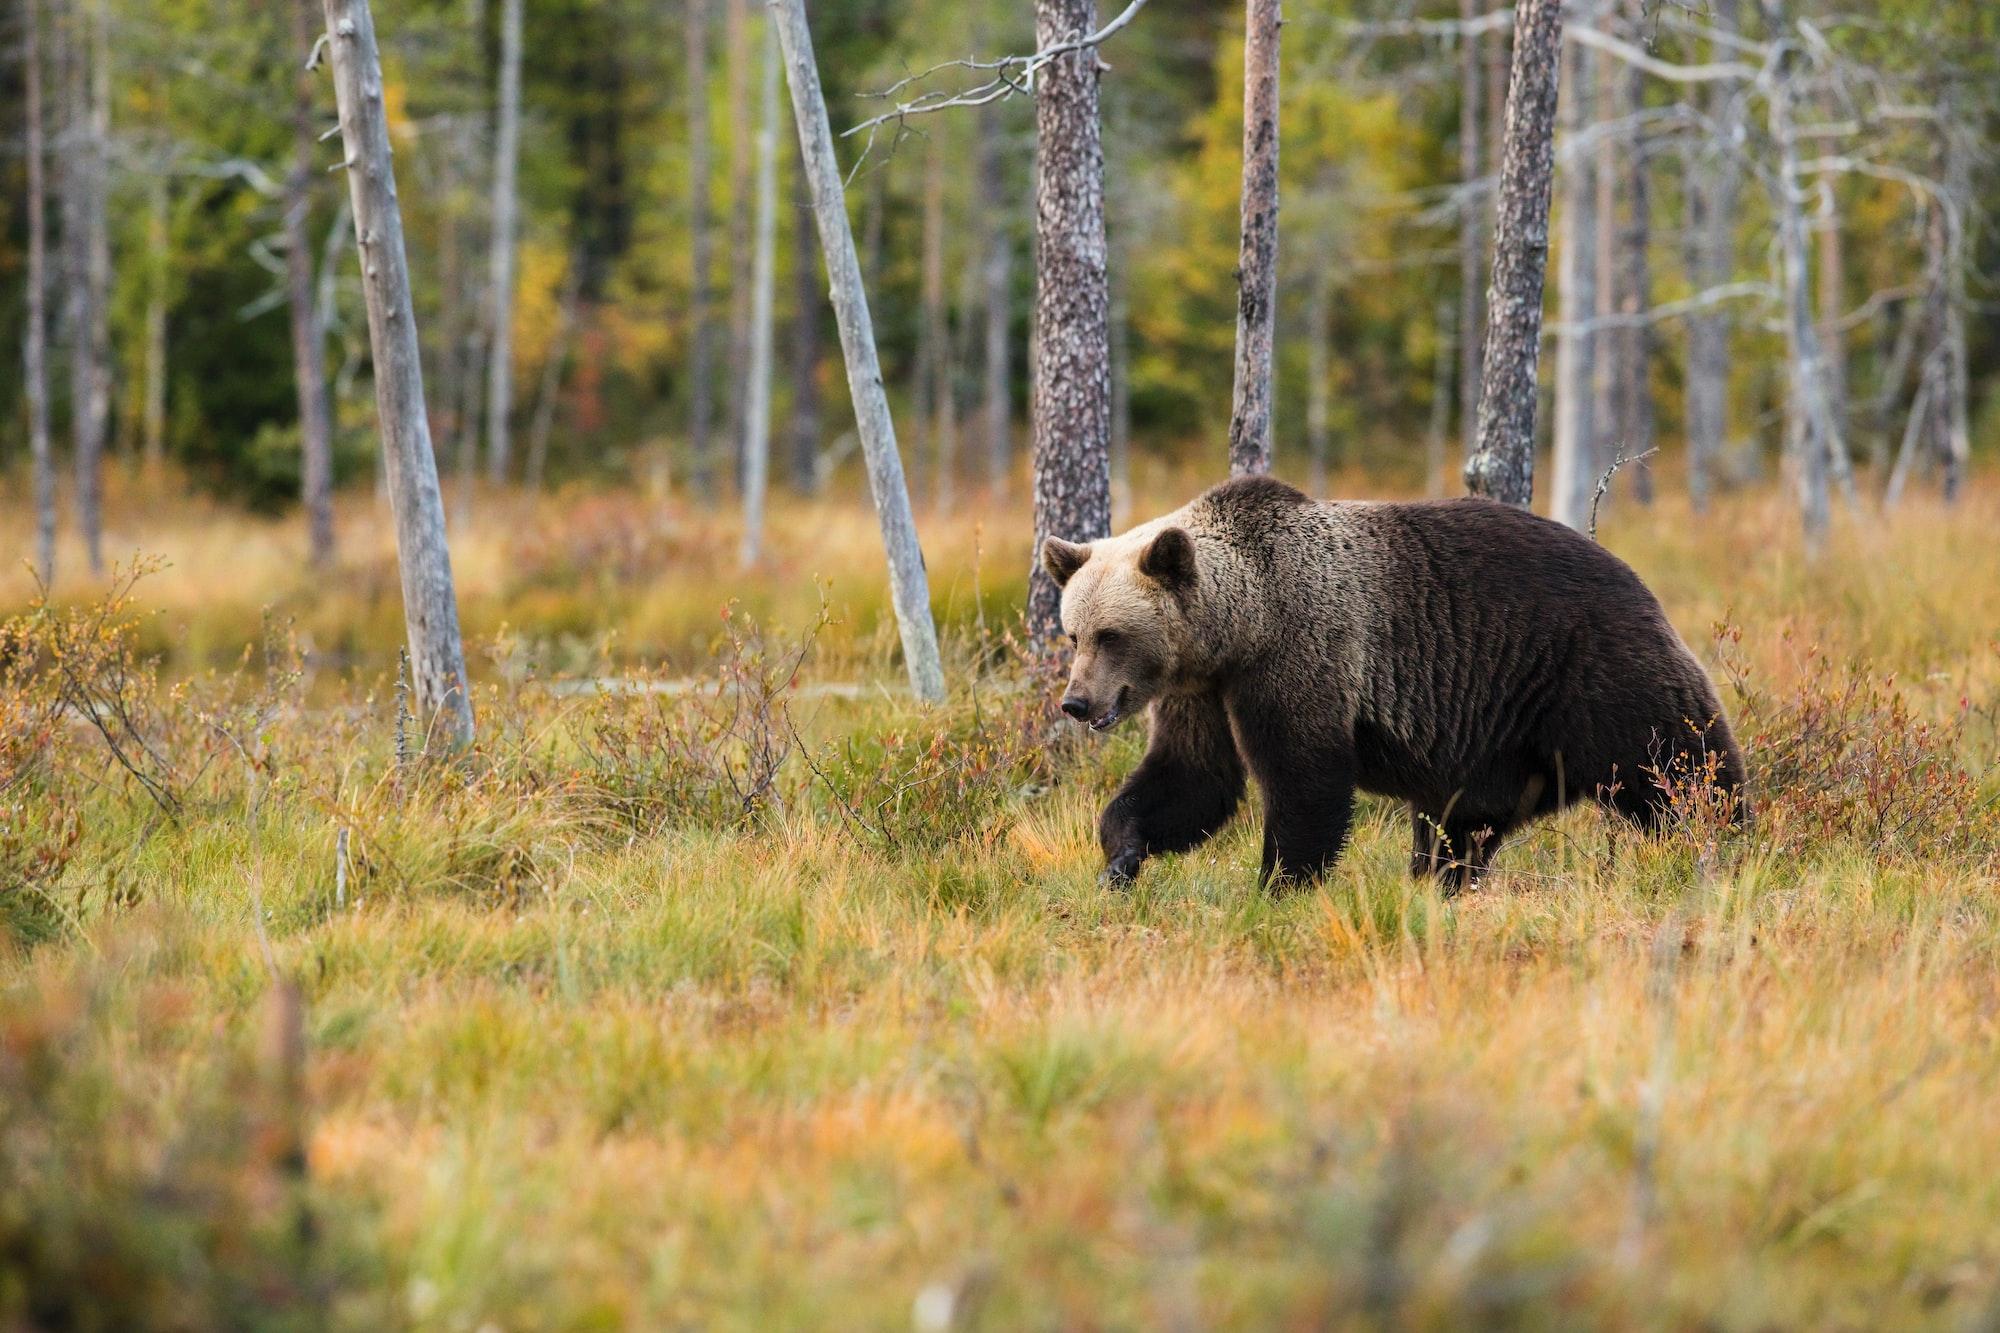 Has everyone forgotten that bears love berries, new shoots, and honey? by Zdeněk Macháček for Unsplash